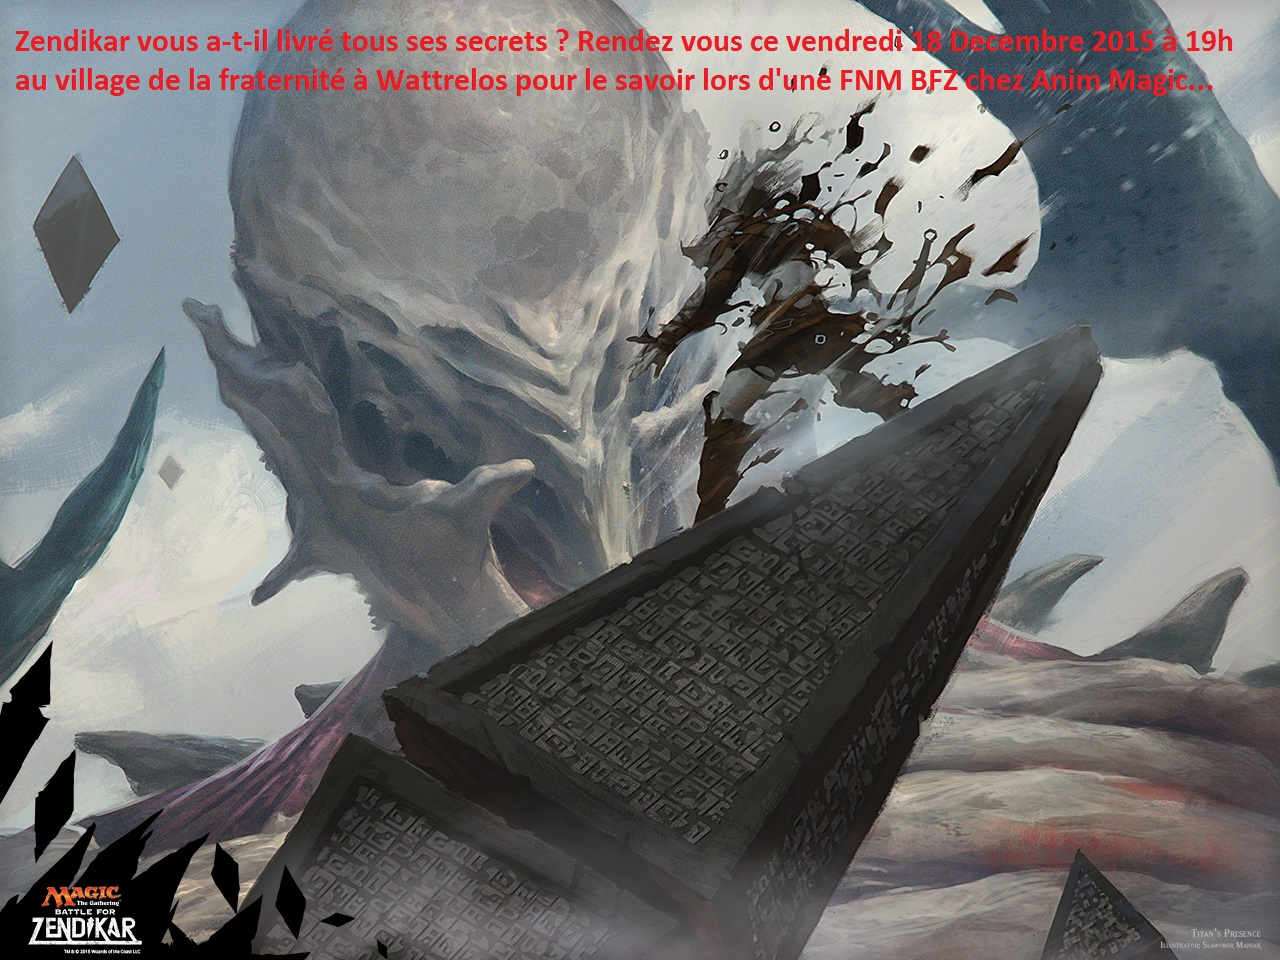 Titans-Presence_BFZ_1280x960_Wallpaper